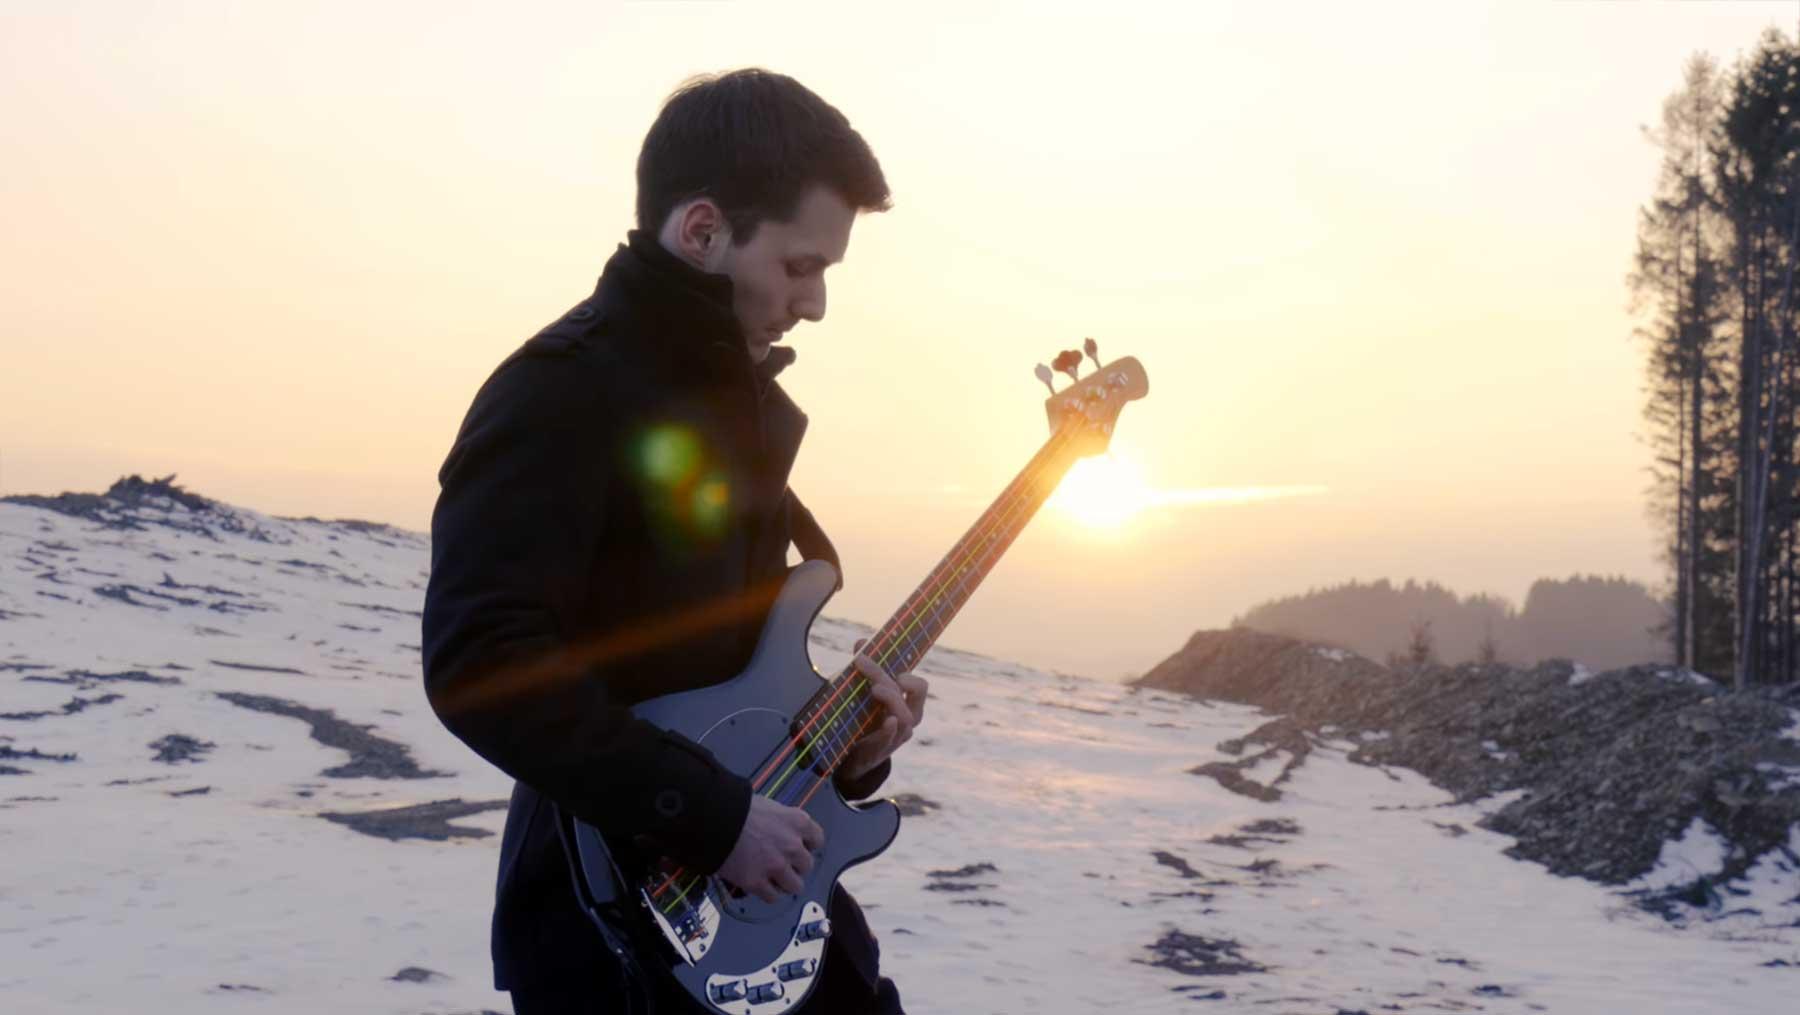 TommyLeeDepp spielt total tolle Bass-Cover bekannter Rocksongs TommyLeeDepp-Bass-Cover